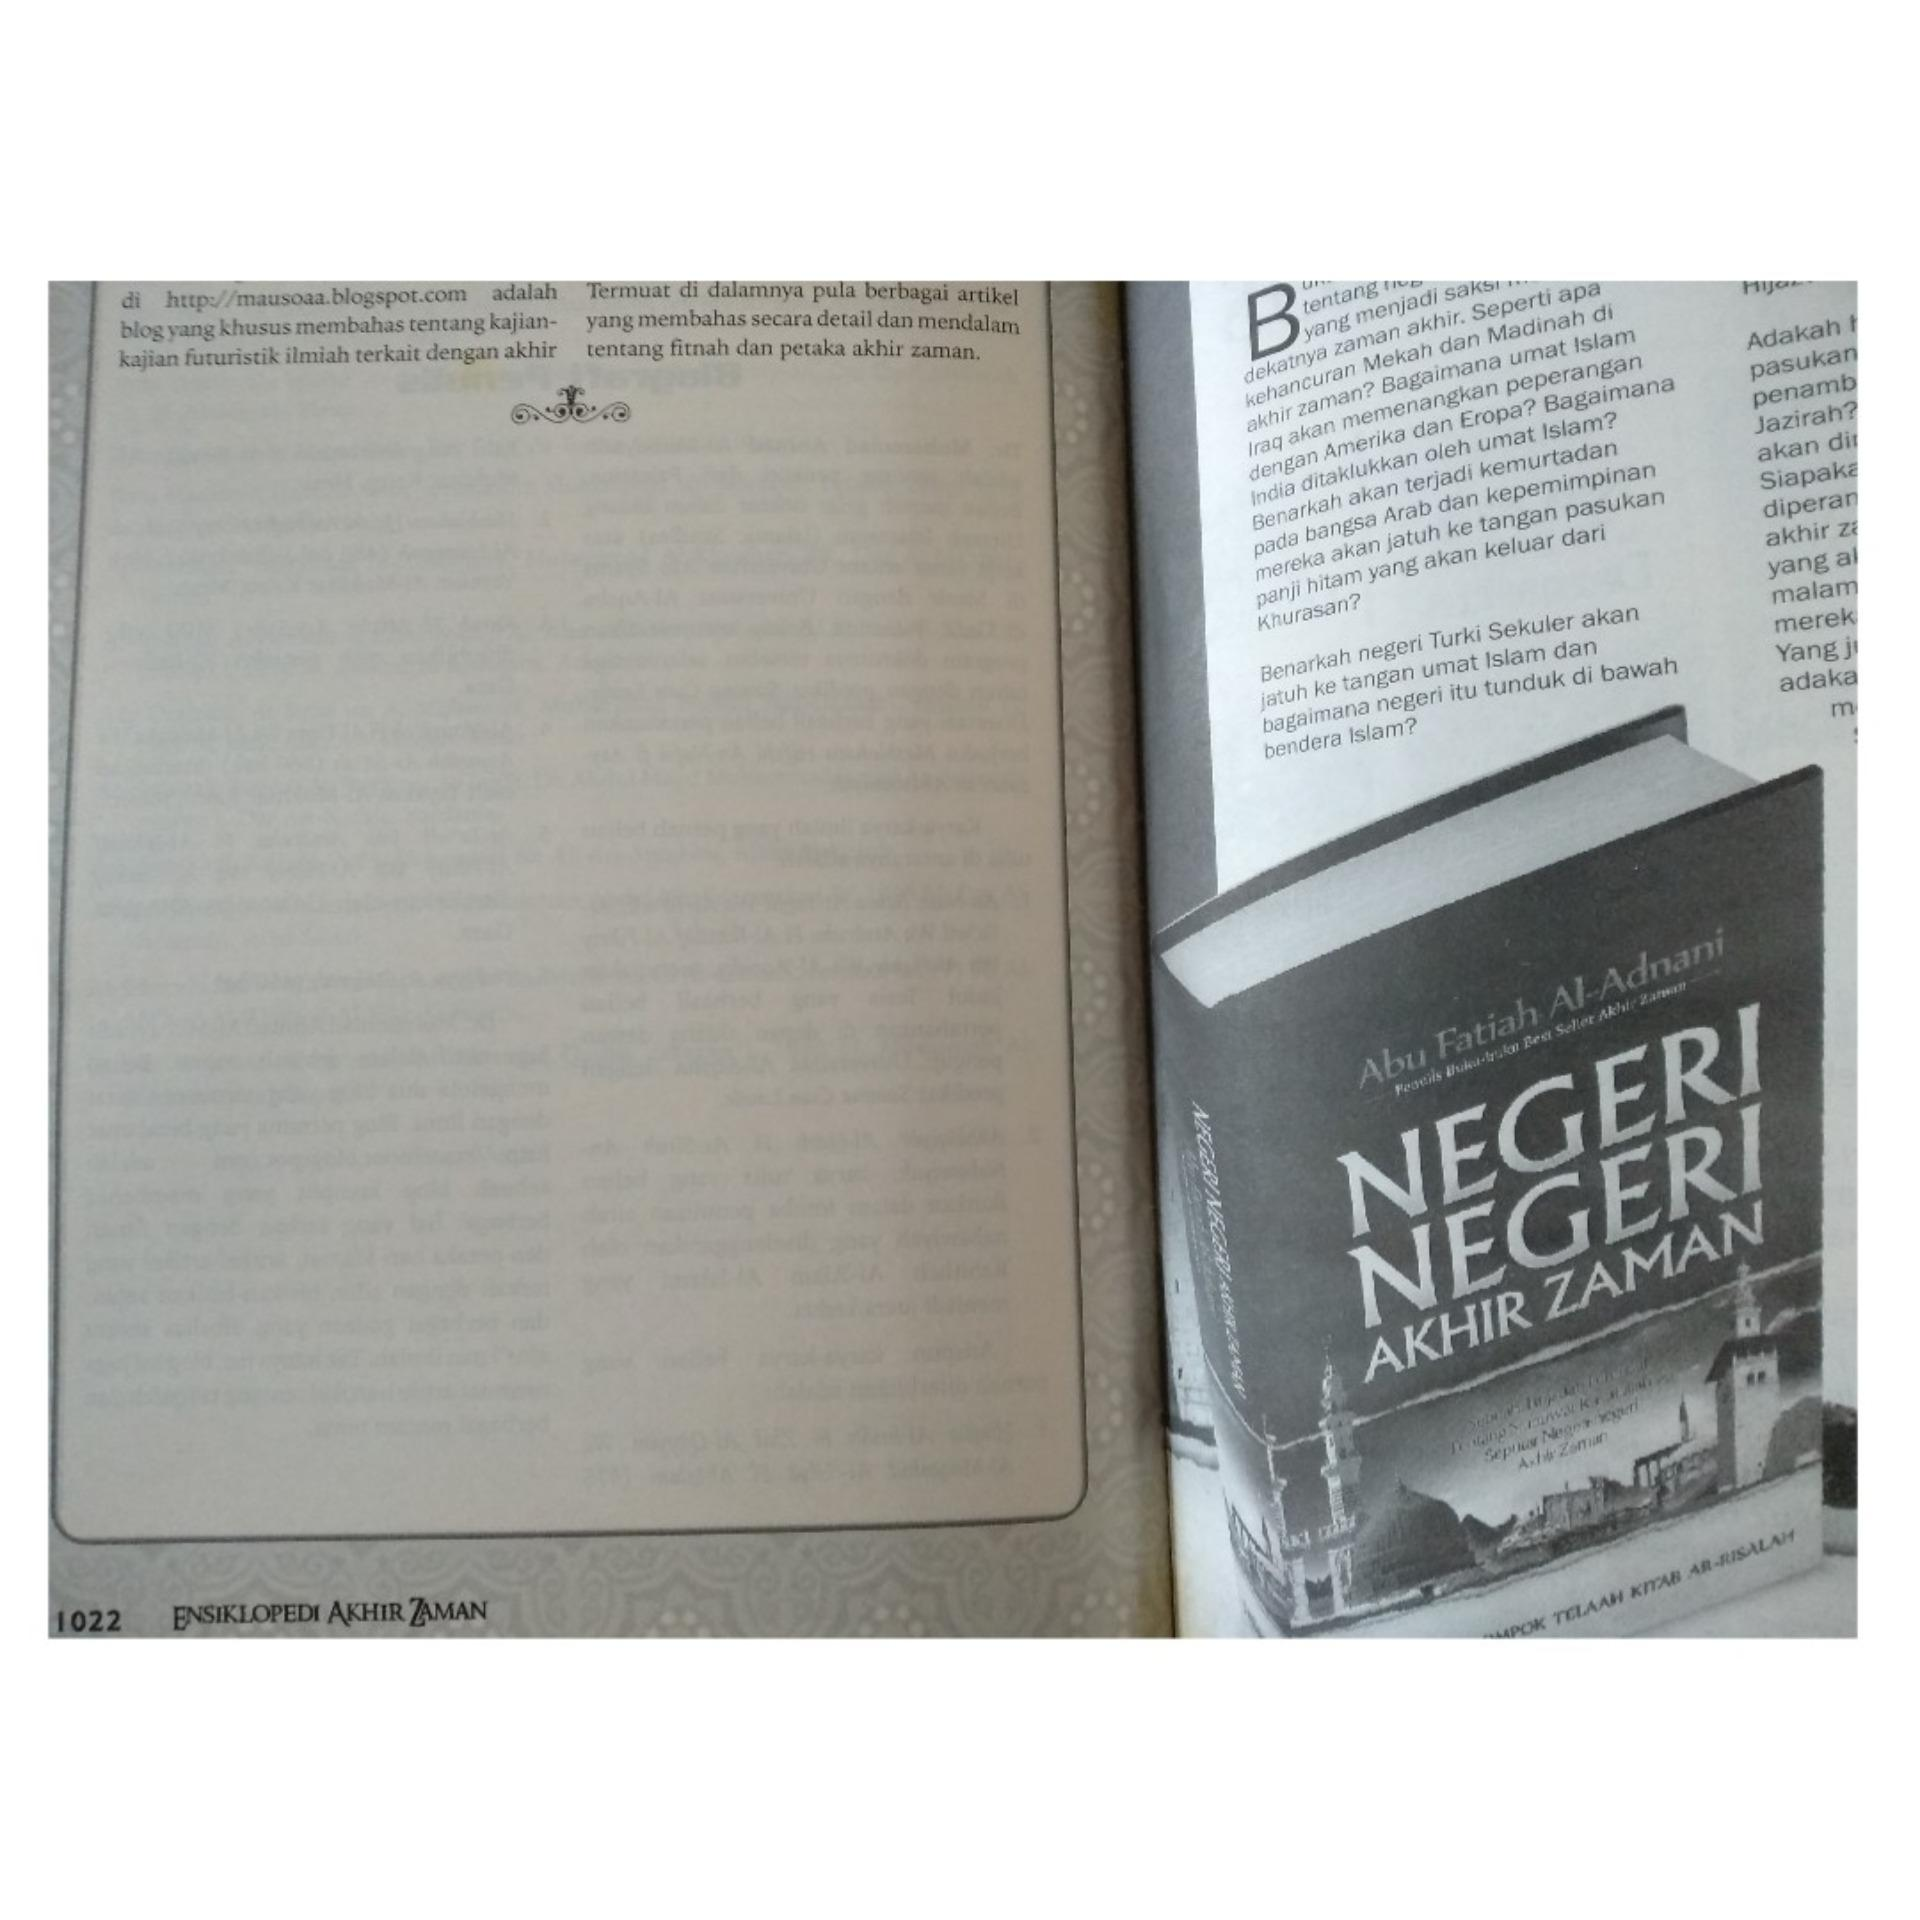 TBIJ - Ensiklopedi Akhir Zaman - Granada Mediatama - Packing Kardus | Lazada Indonesia